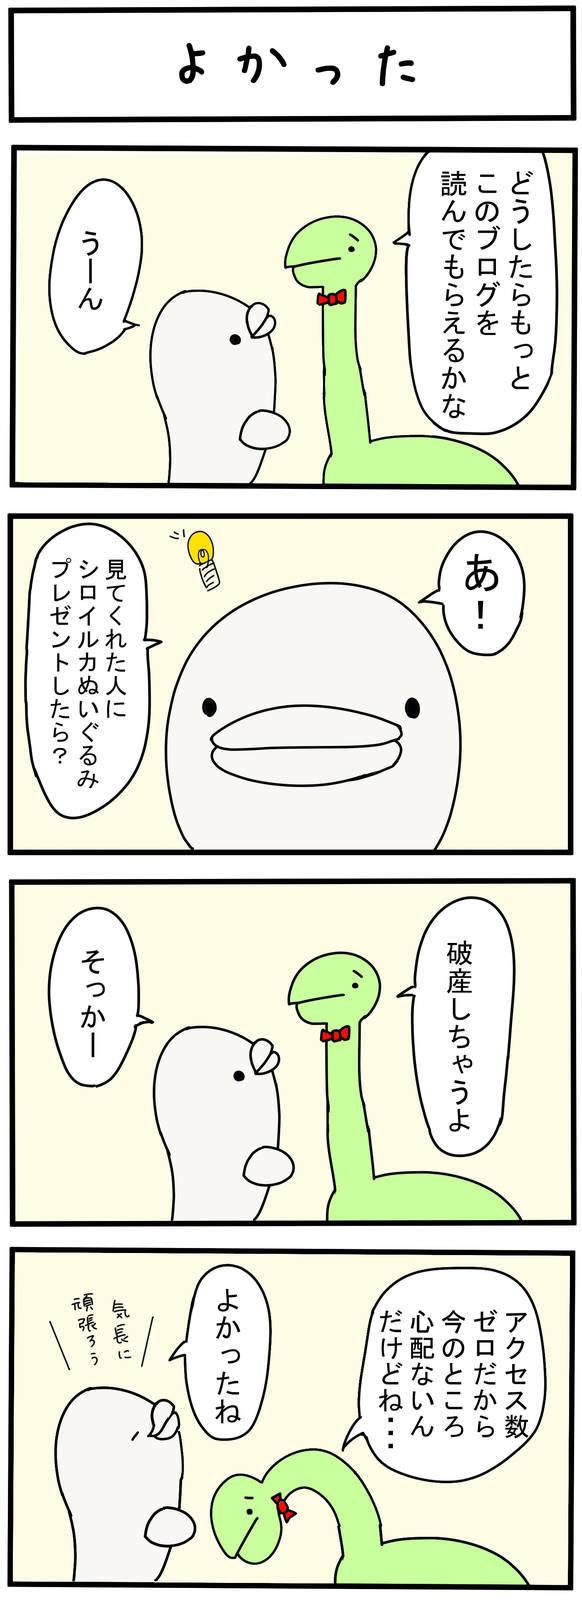 f:id:shiro_iruka:20190315222813j:plain